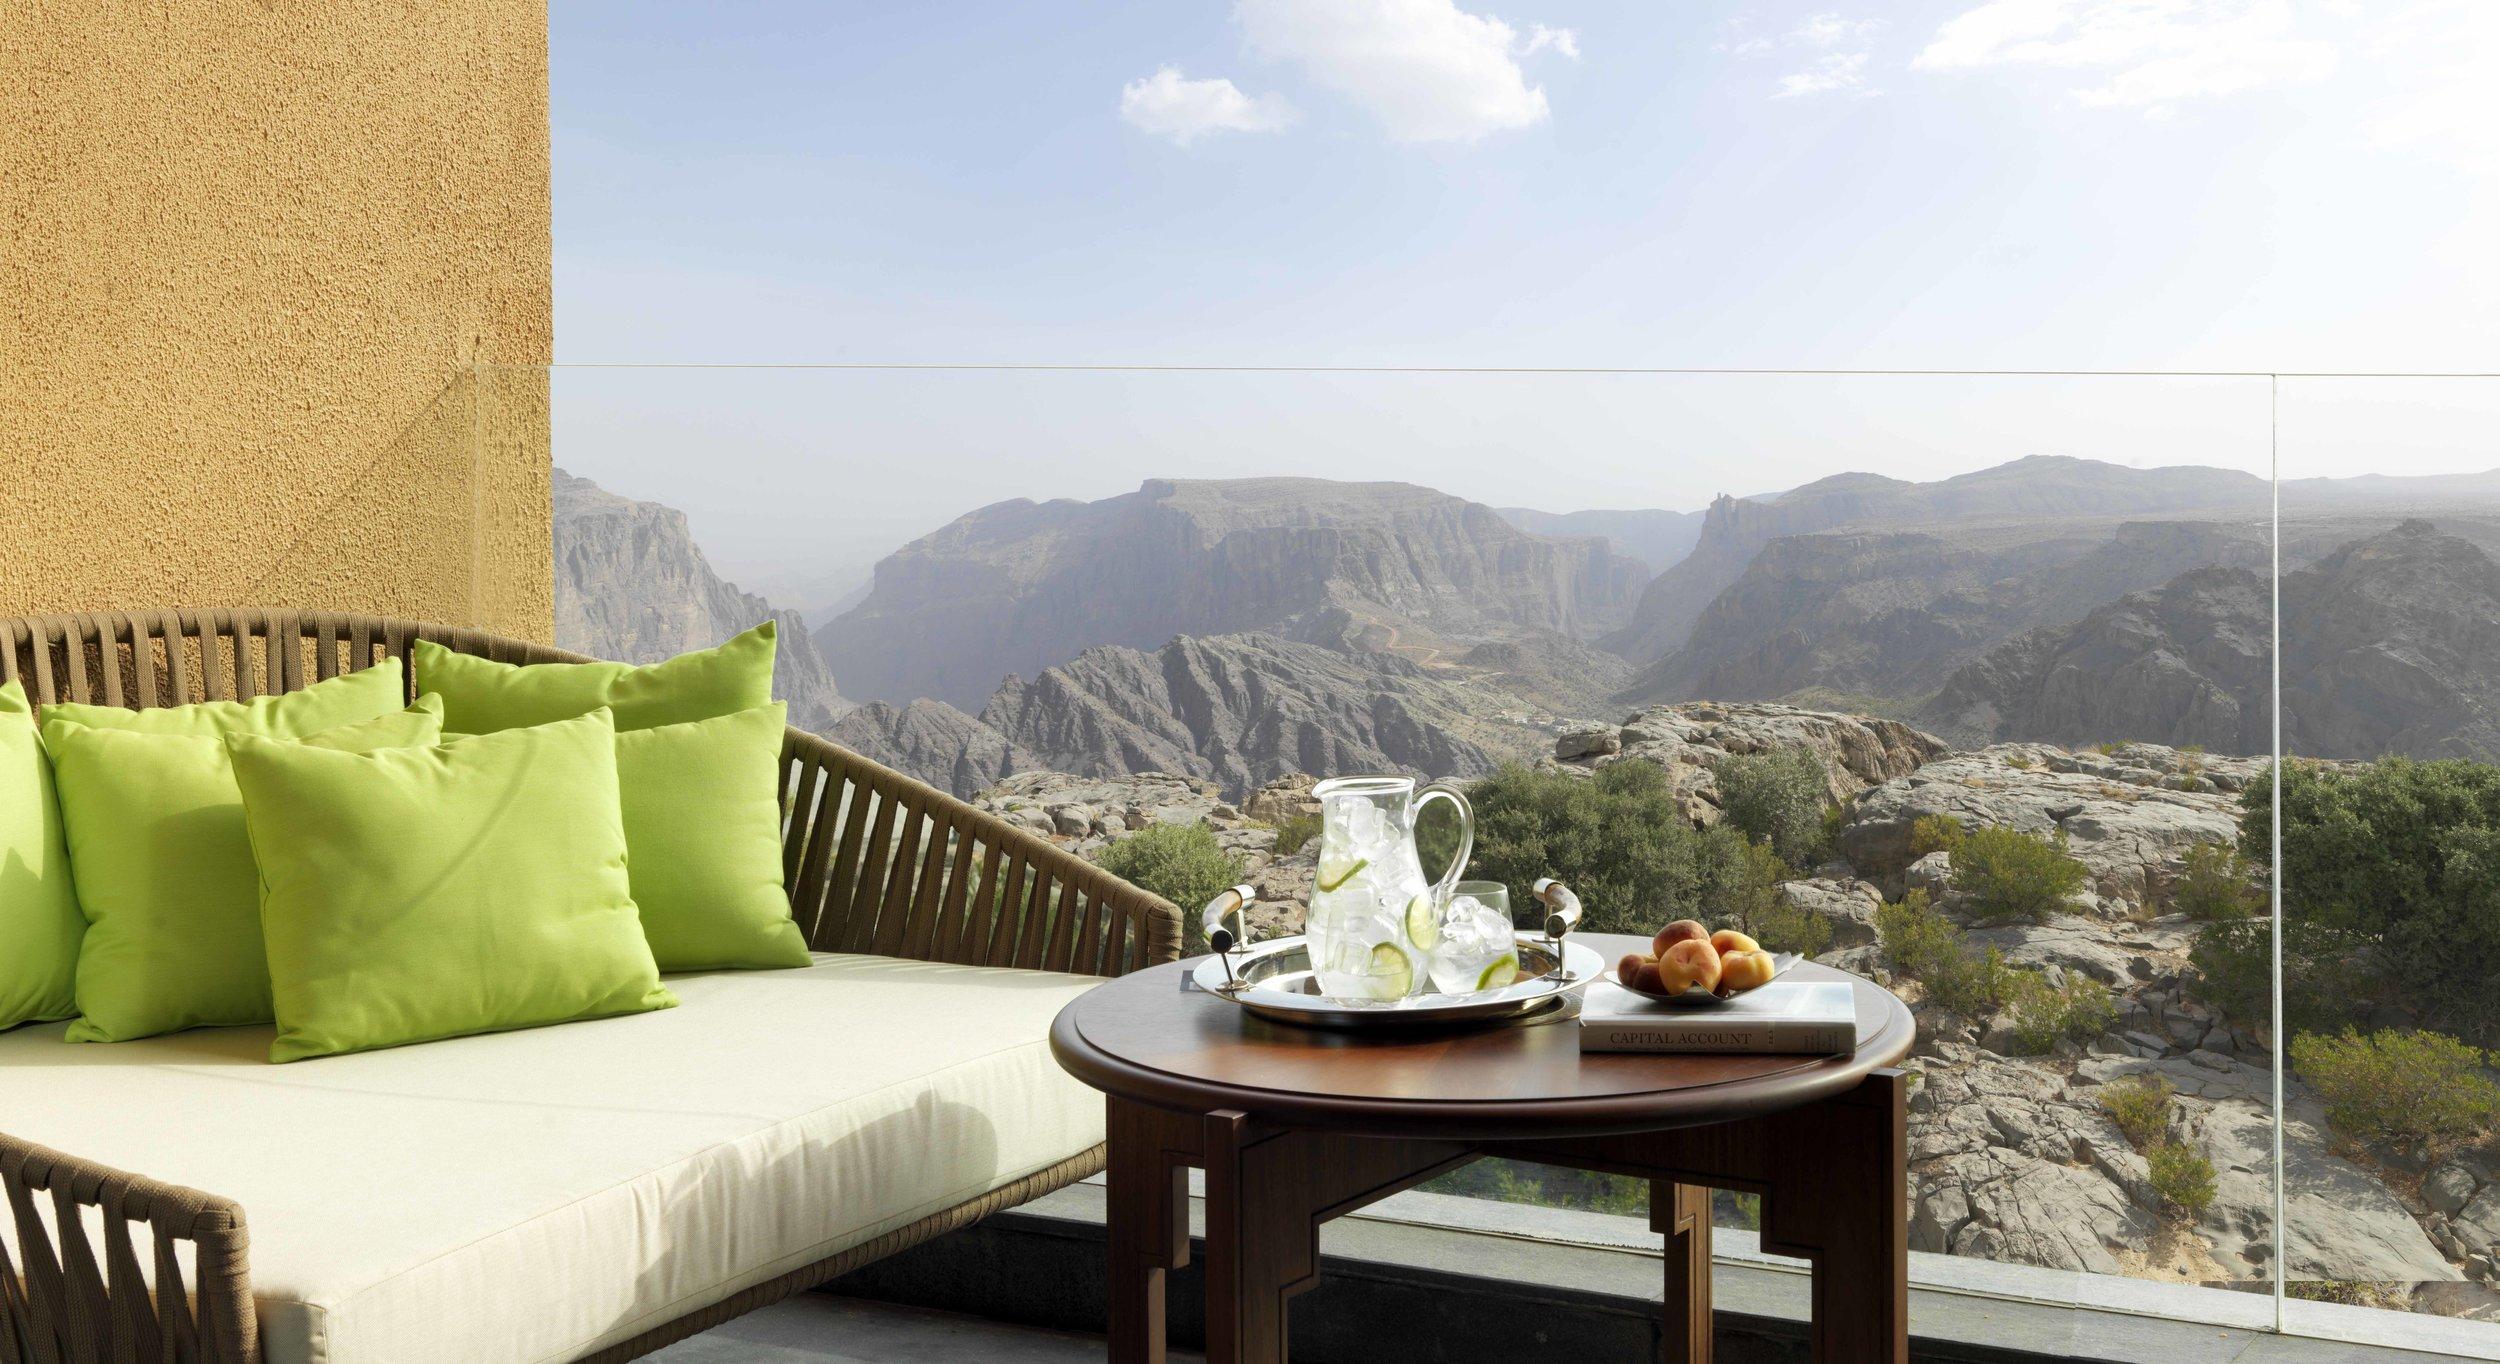 Anantara Al Jabal Al Akhdar Resort - Deluxe Canyon View Room Balcony.jpg